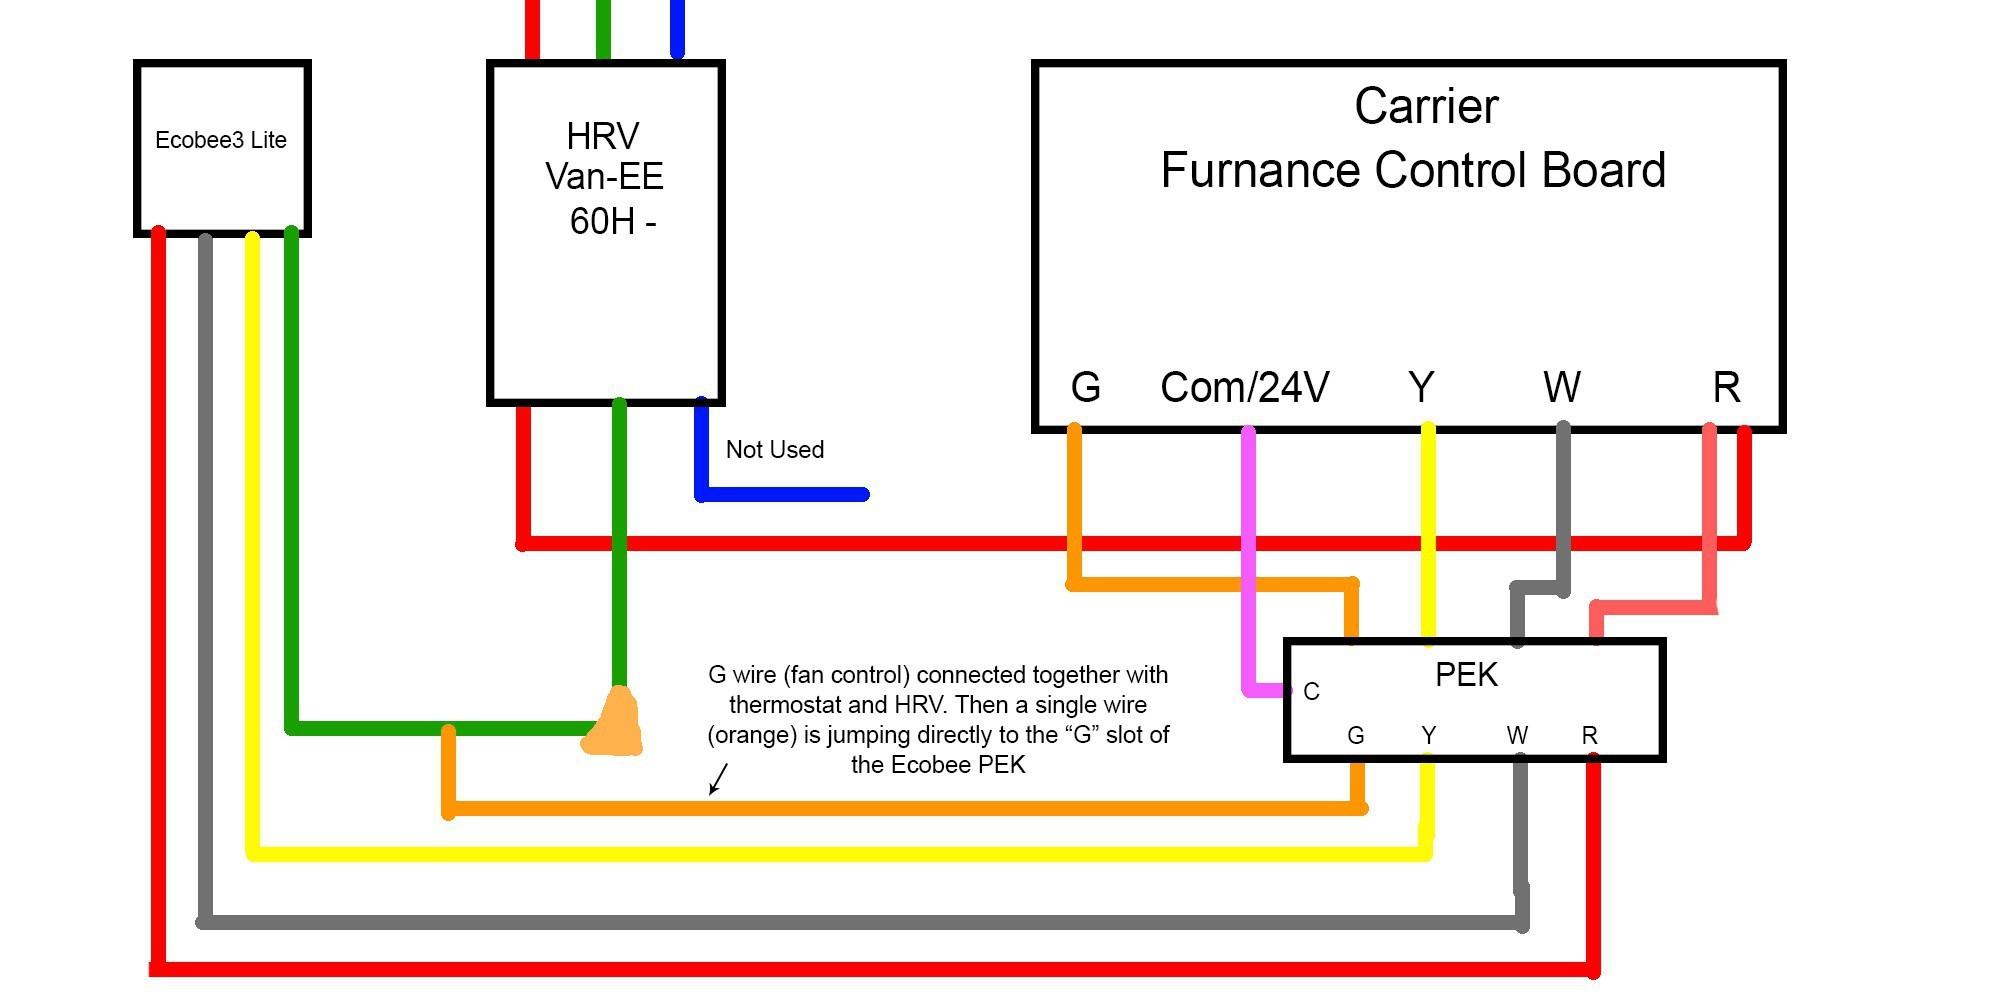 Ecobee3 Wiring Diagram Fresh Elegant Ecobee3 Wiring Diagram Diagram